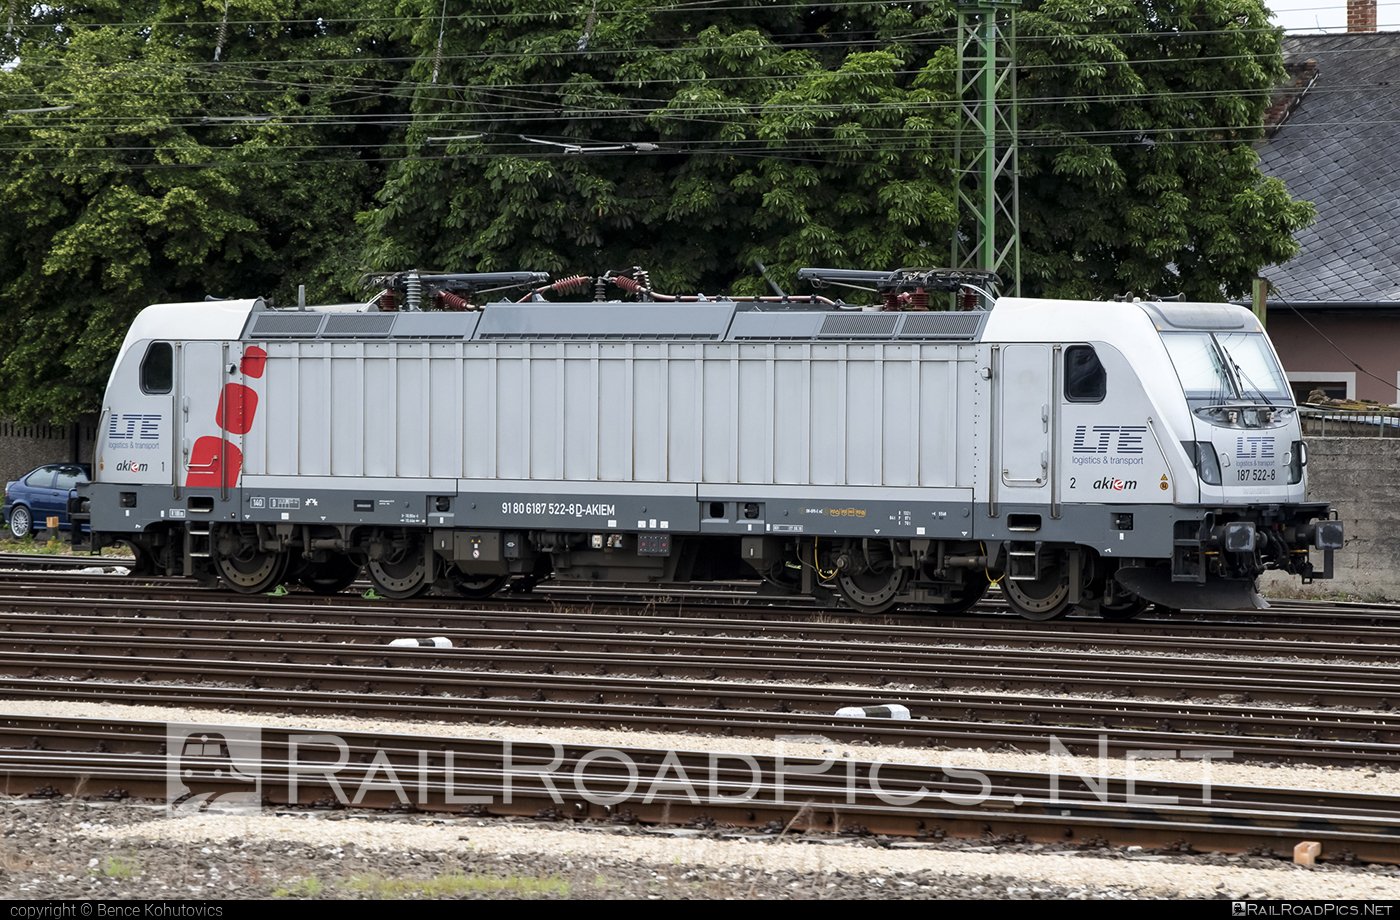 Bombardier TRAXX F140 AC3 - 187 522-8 operated by LTE Hungária Vasúti Árufuvarozó és Logisztikai Kft. #akiem #akiemsas #bombardier #bombardiertraxx #traxx #traxxf140 #traxxf140ac #traxxf140ac3